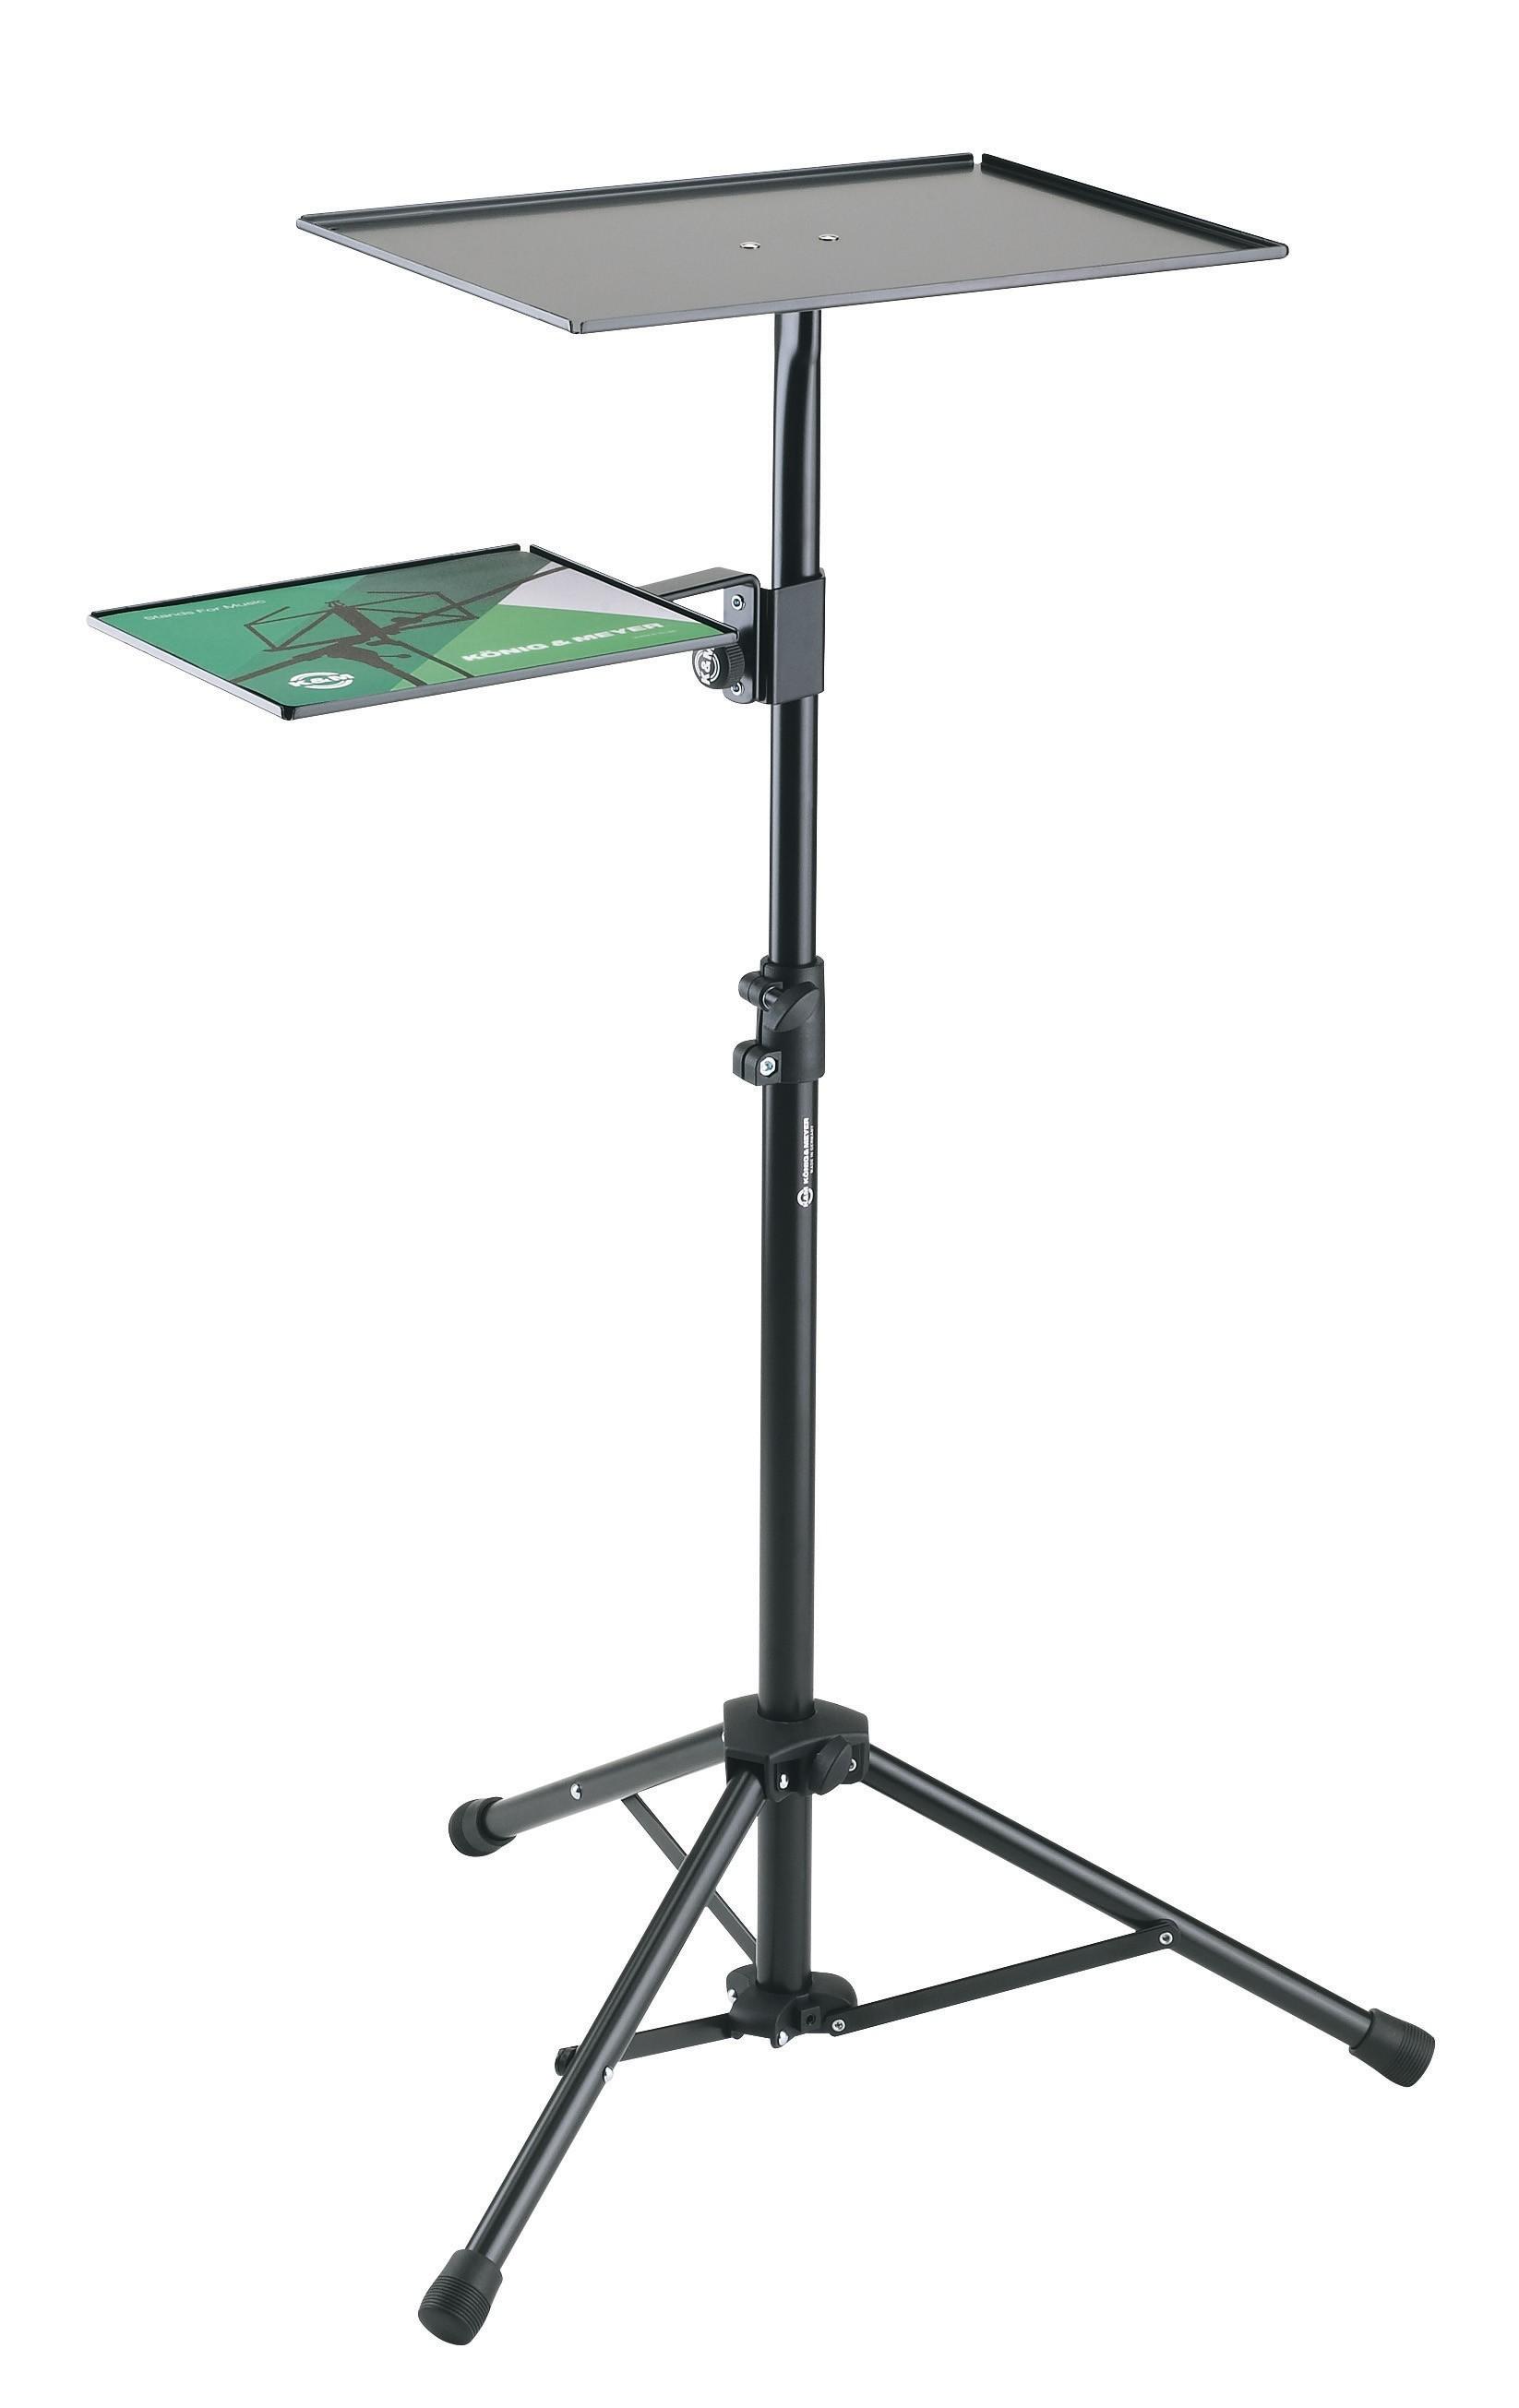 Konig & Meyer 12150 Laptop Stand